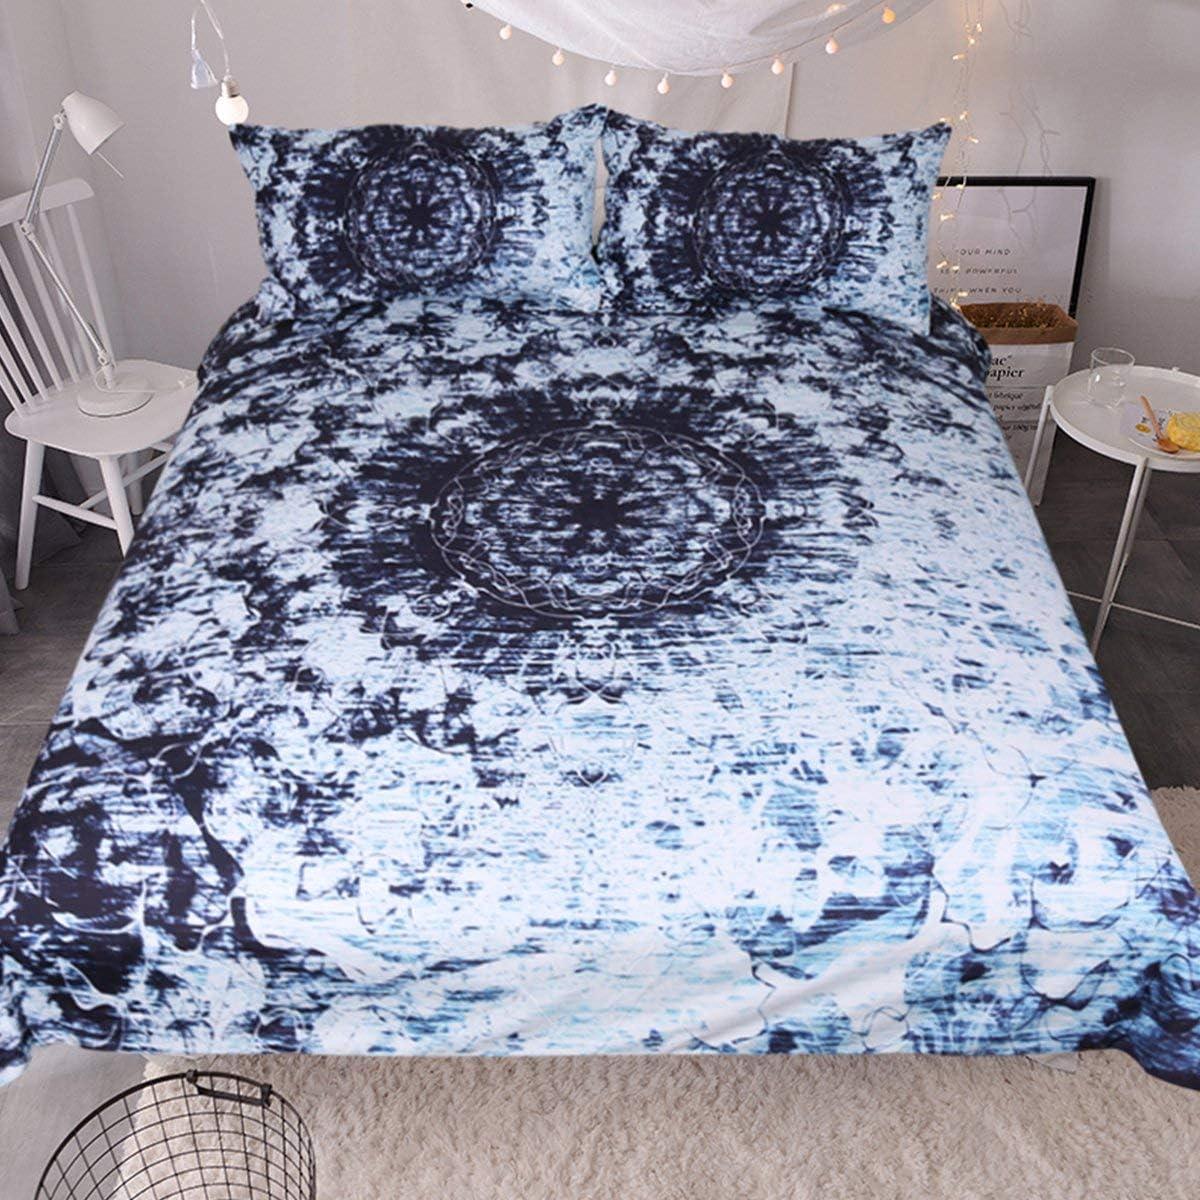 Sleepwish Blue Tie Dye Bedding Retro Mandala Bedding Twin Size 3 Pieces Bohemian Style Duvet Covers with 2 Pillow Shams